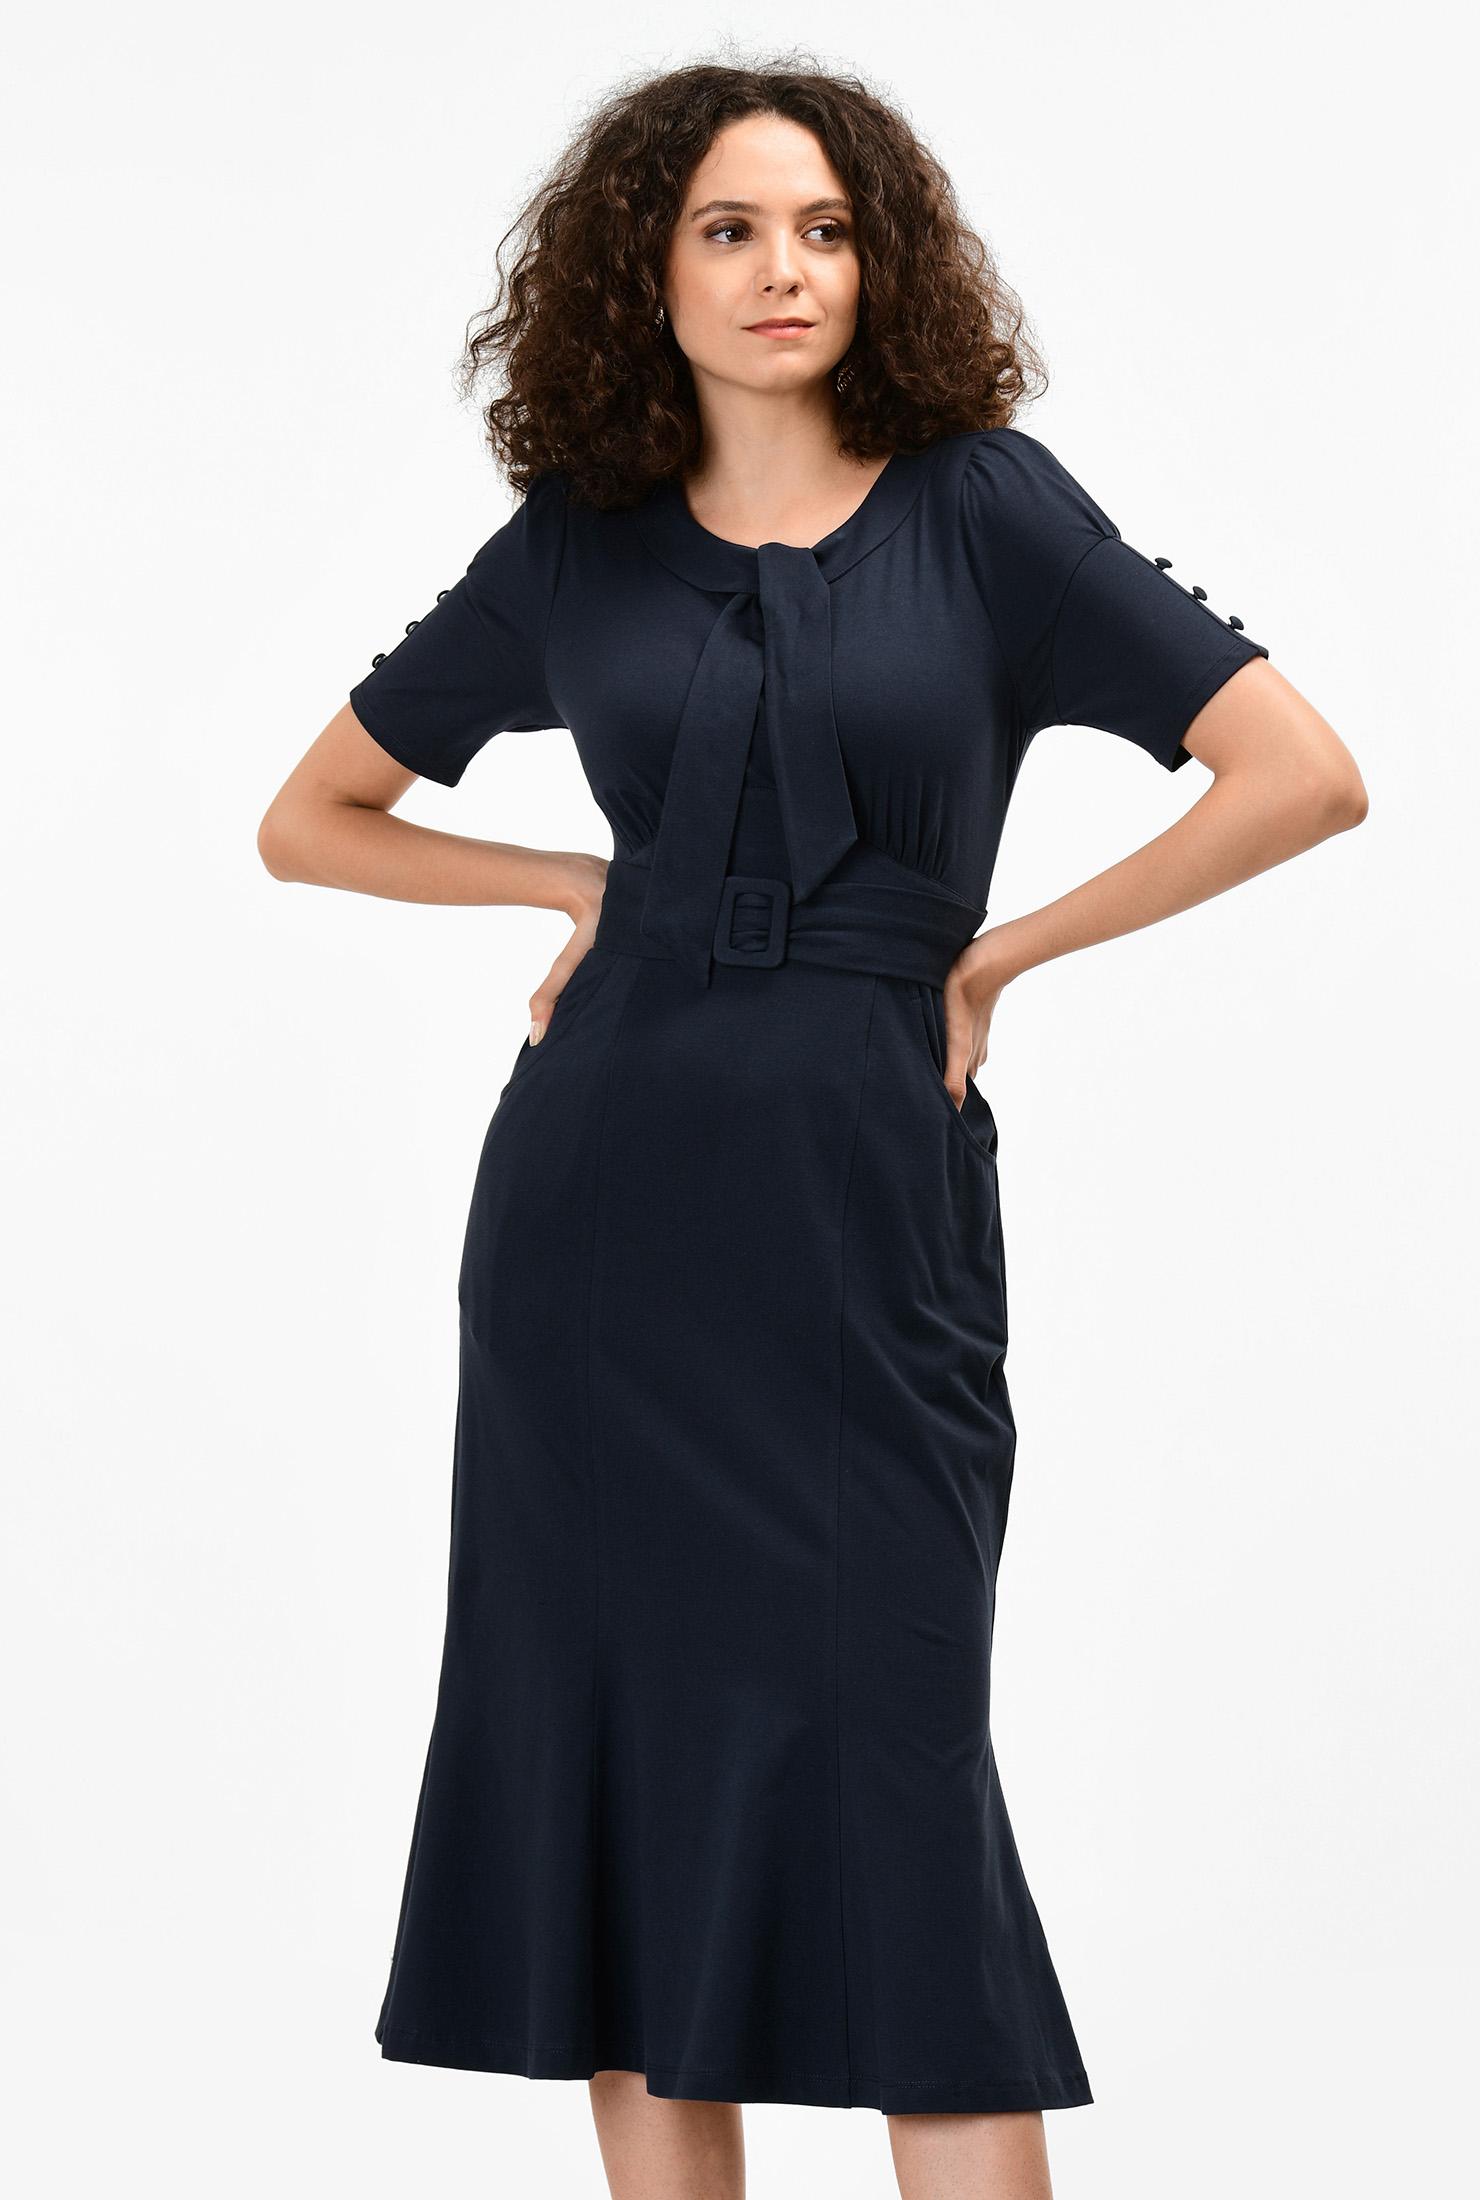 Wiggle Dresses | Pencil Dresses 40s, 50s, 60s Flounce hem cotton knit sheath dress $59.95 AT vintagedancer.com